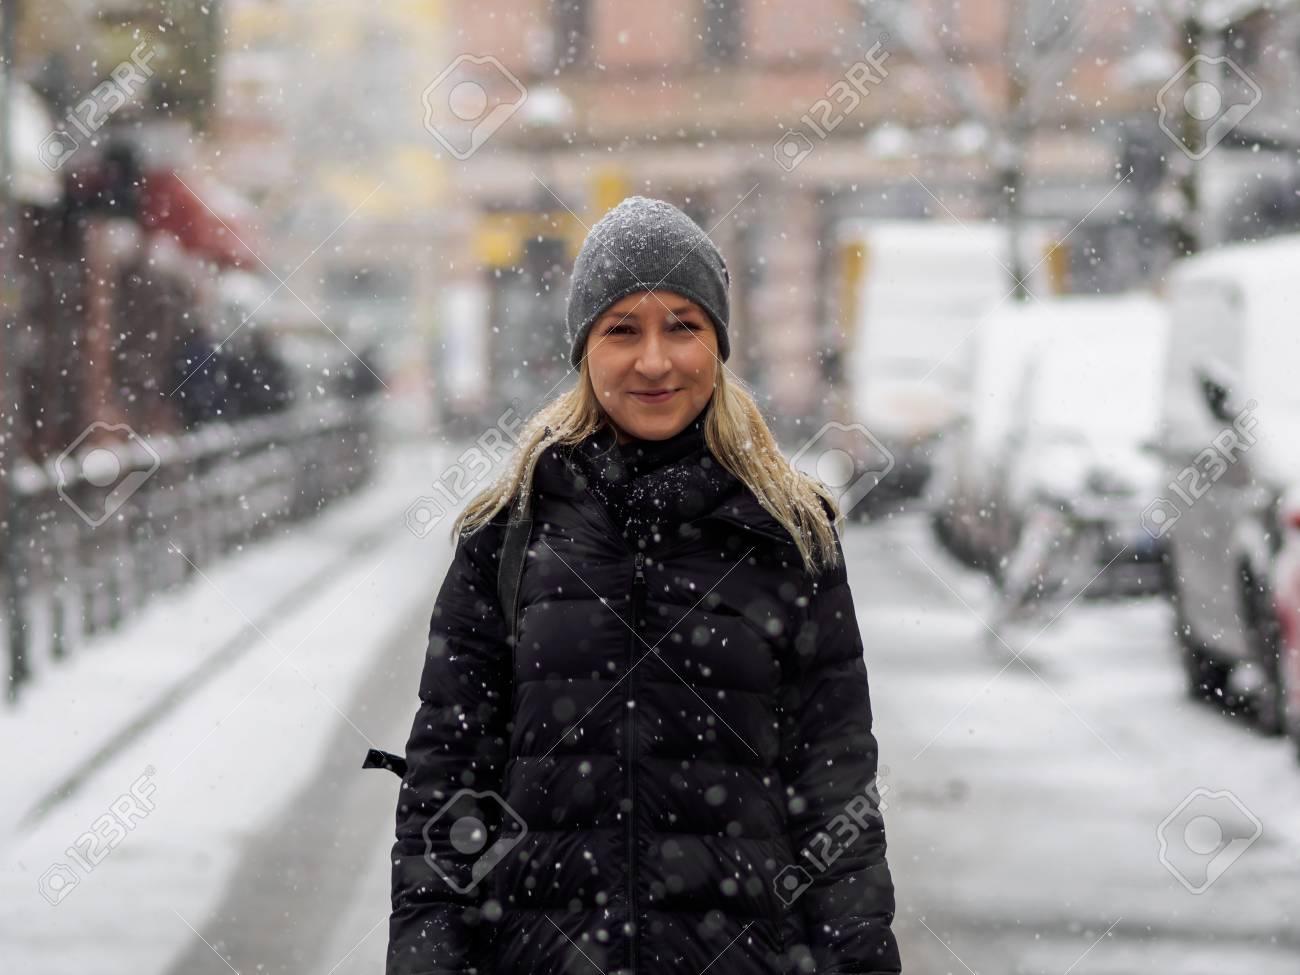 Blonde girl in the snow Standard-Bild - 91306397